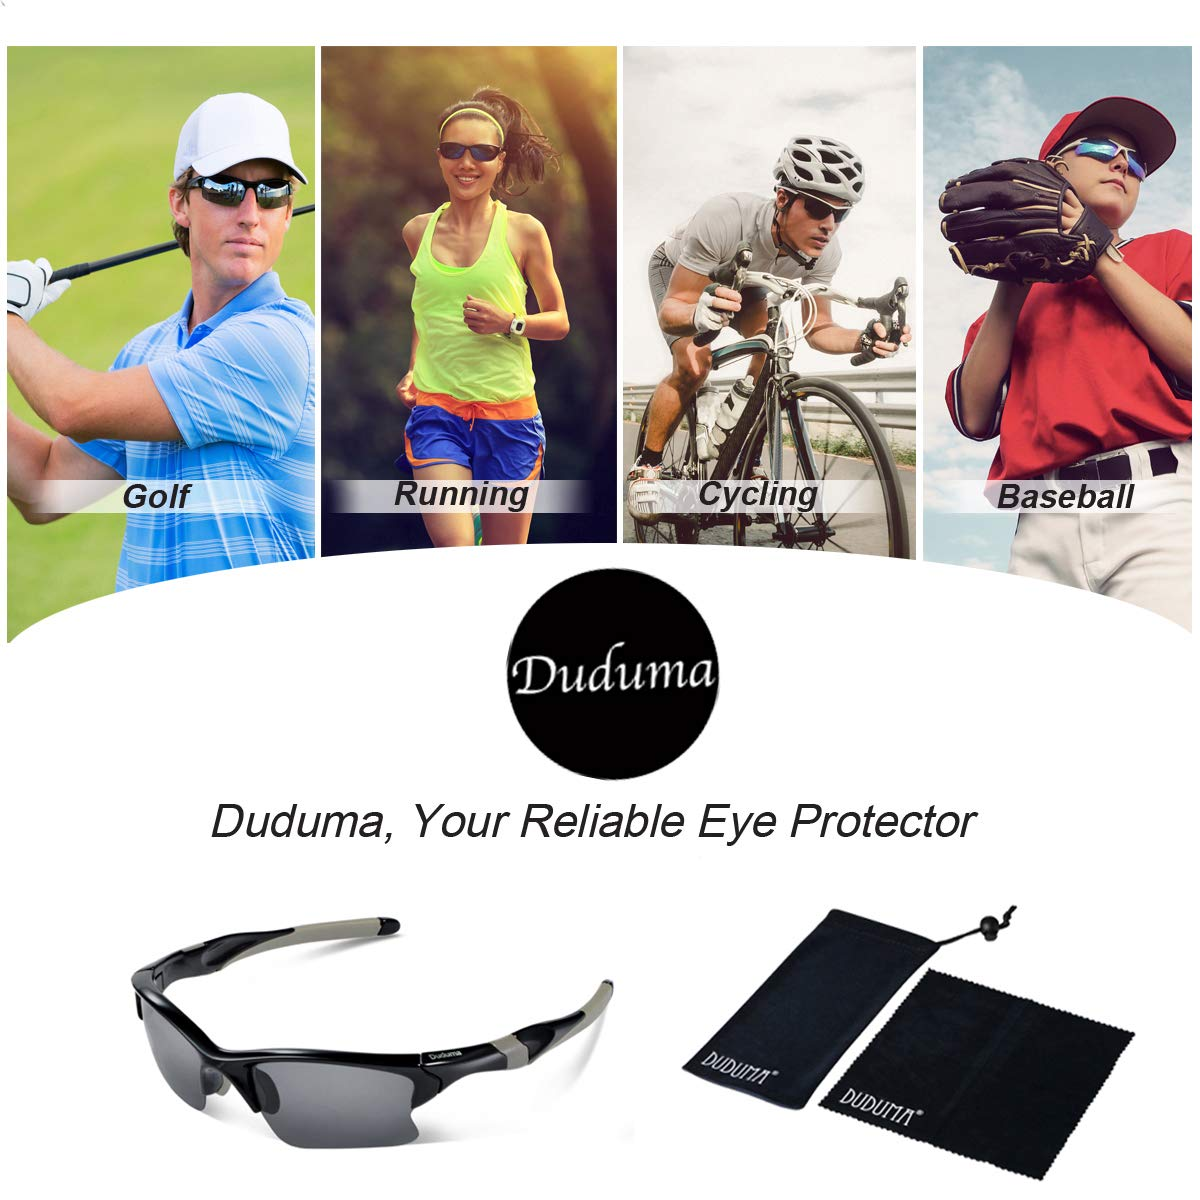 eba4a16e93e Amazon.com  Duduma Polarized Sports Sunglasses for Men Women Baseball  Fishing Golf Running Cycling Driving Softball Hiking Unbreakable Shades  Tr566  Sports ...